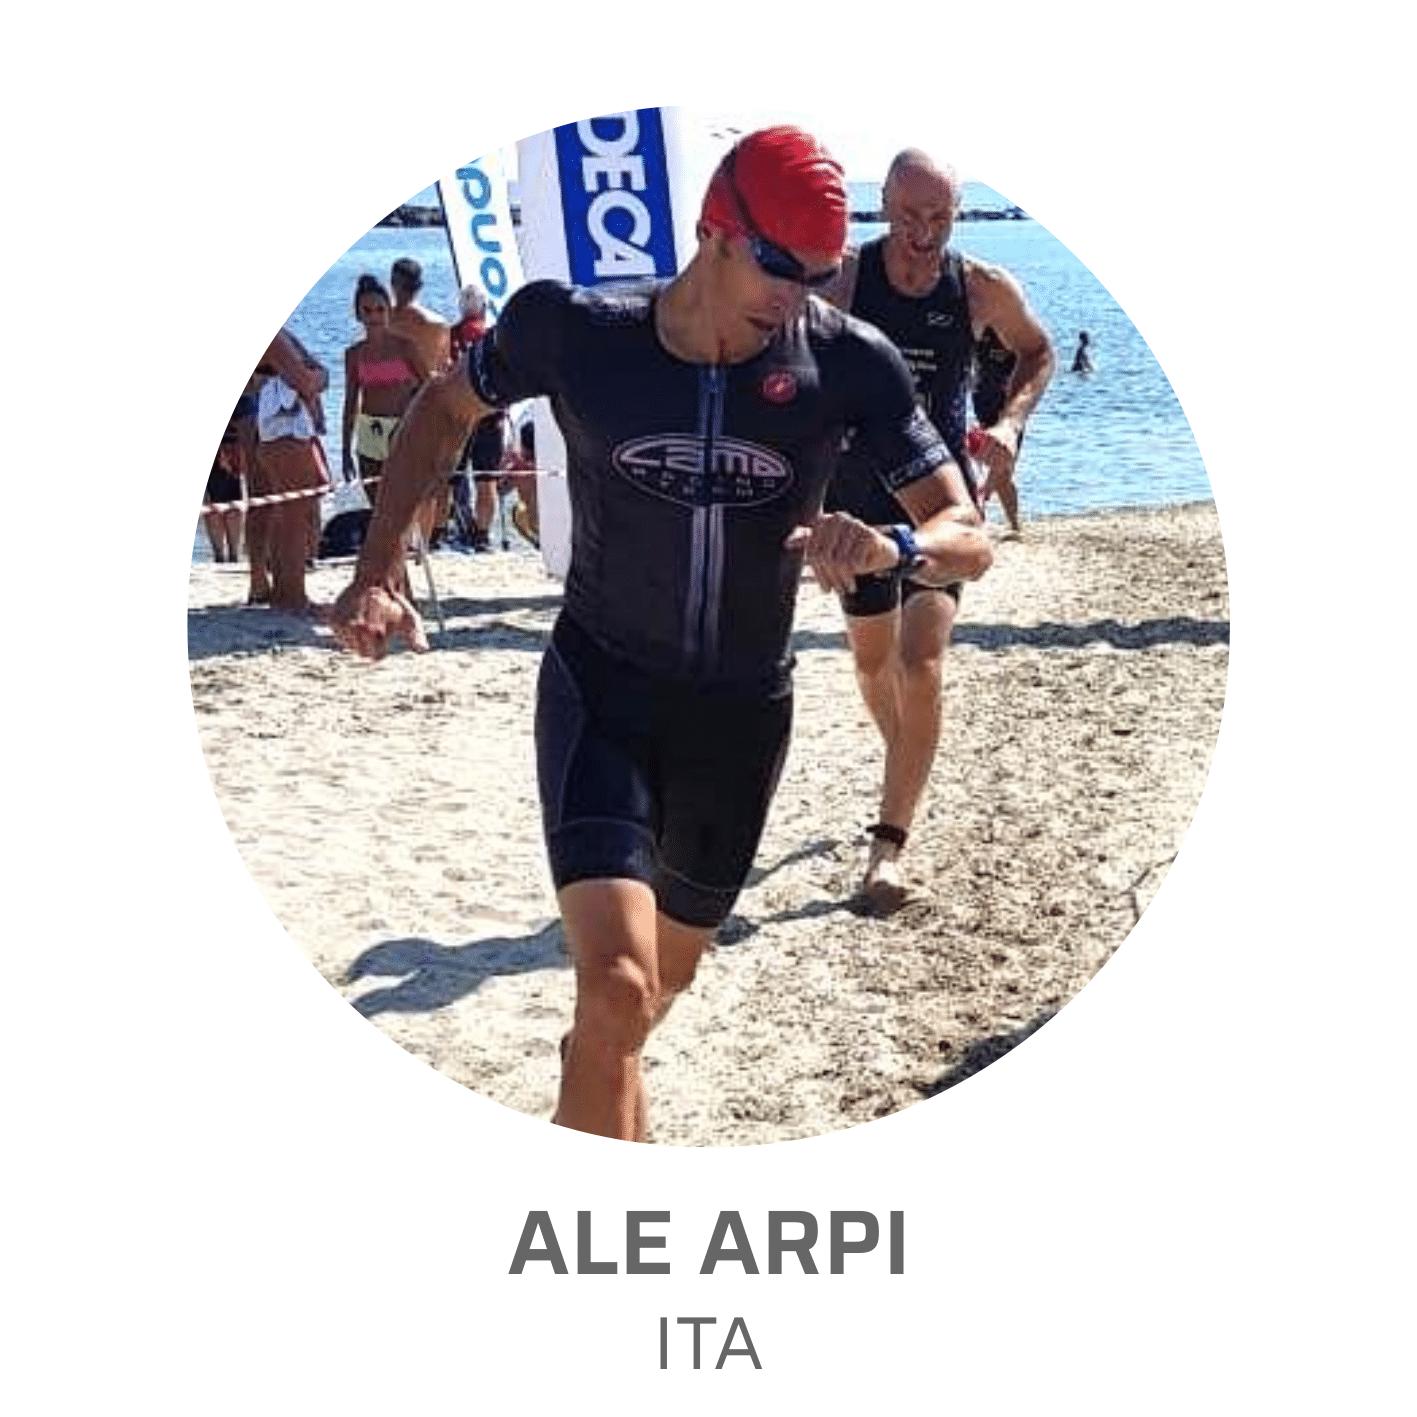 CRT_athletes_website_20190813-01.png